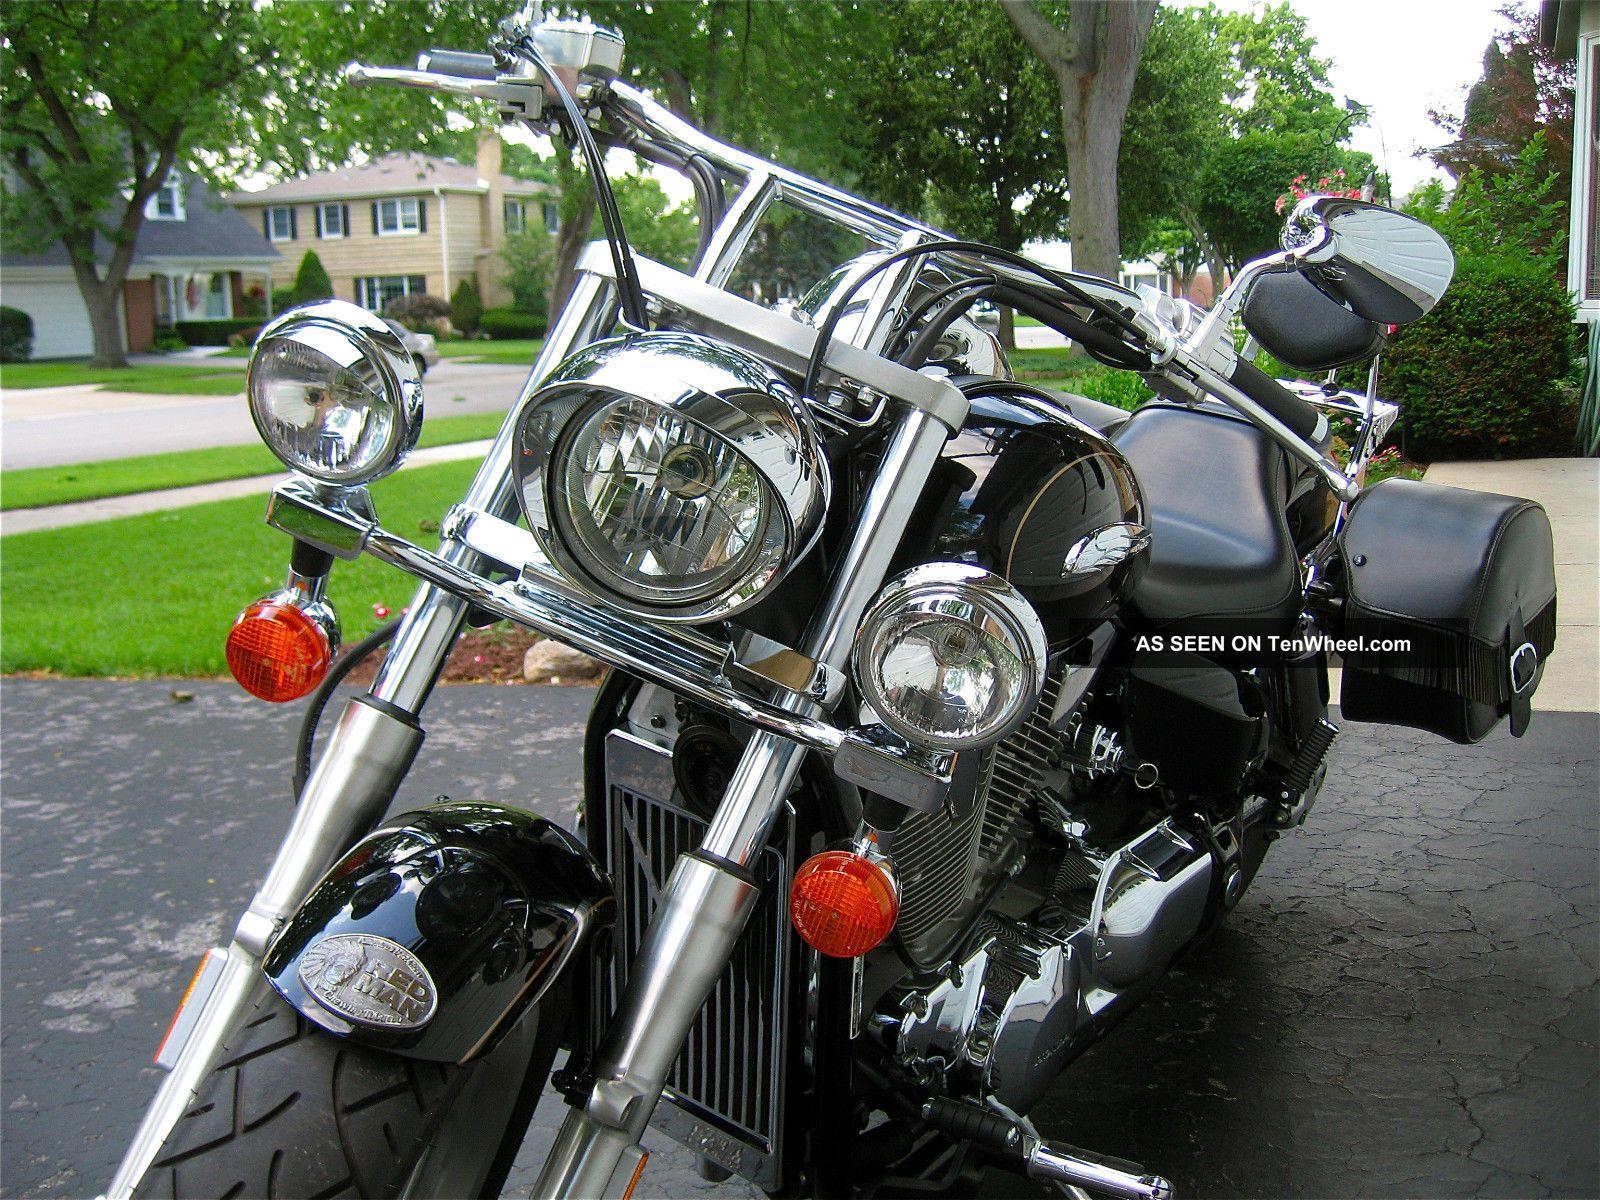 2006 Vtx 1300c, Black, Light Bar, Rear Carrier, Saddle Bags, Check